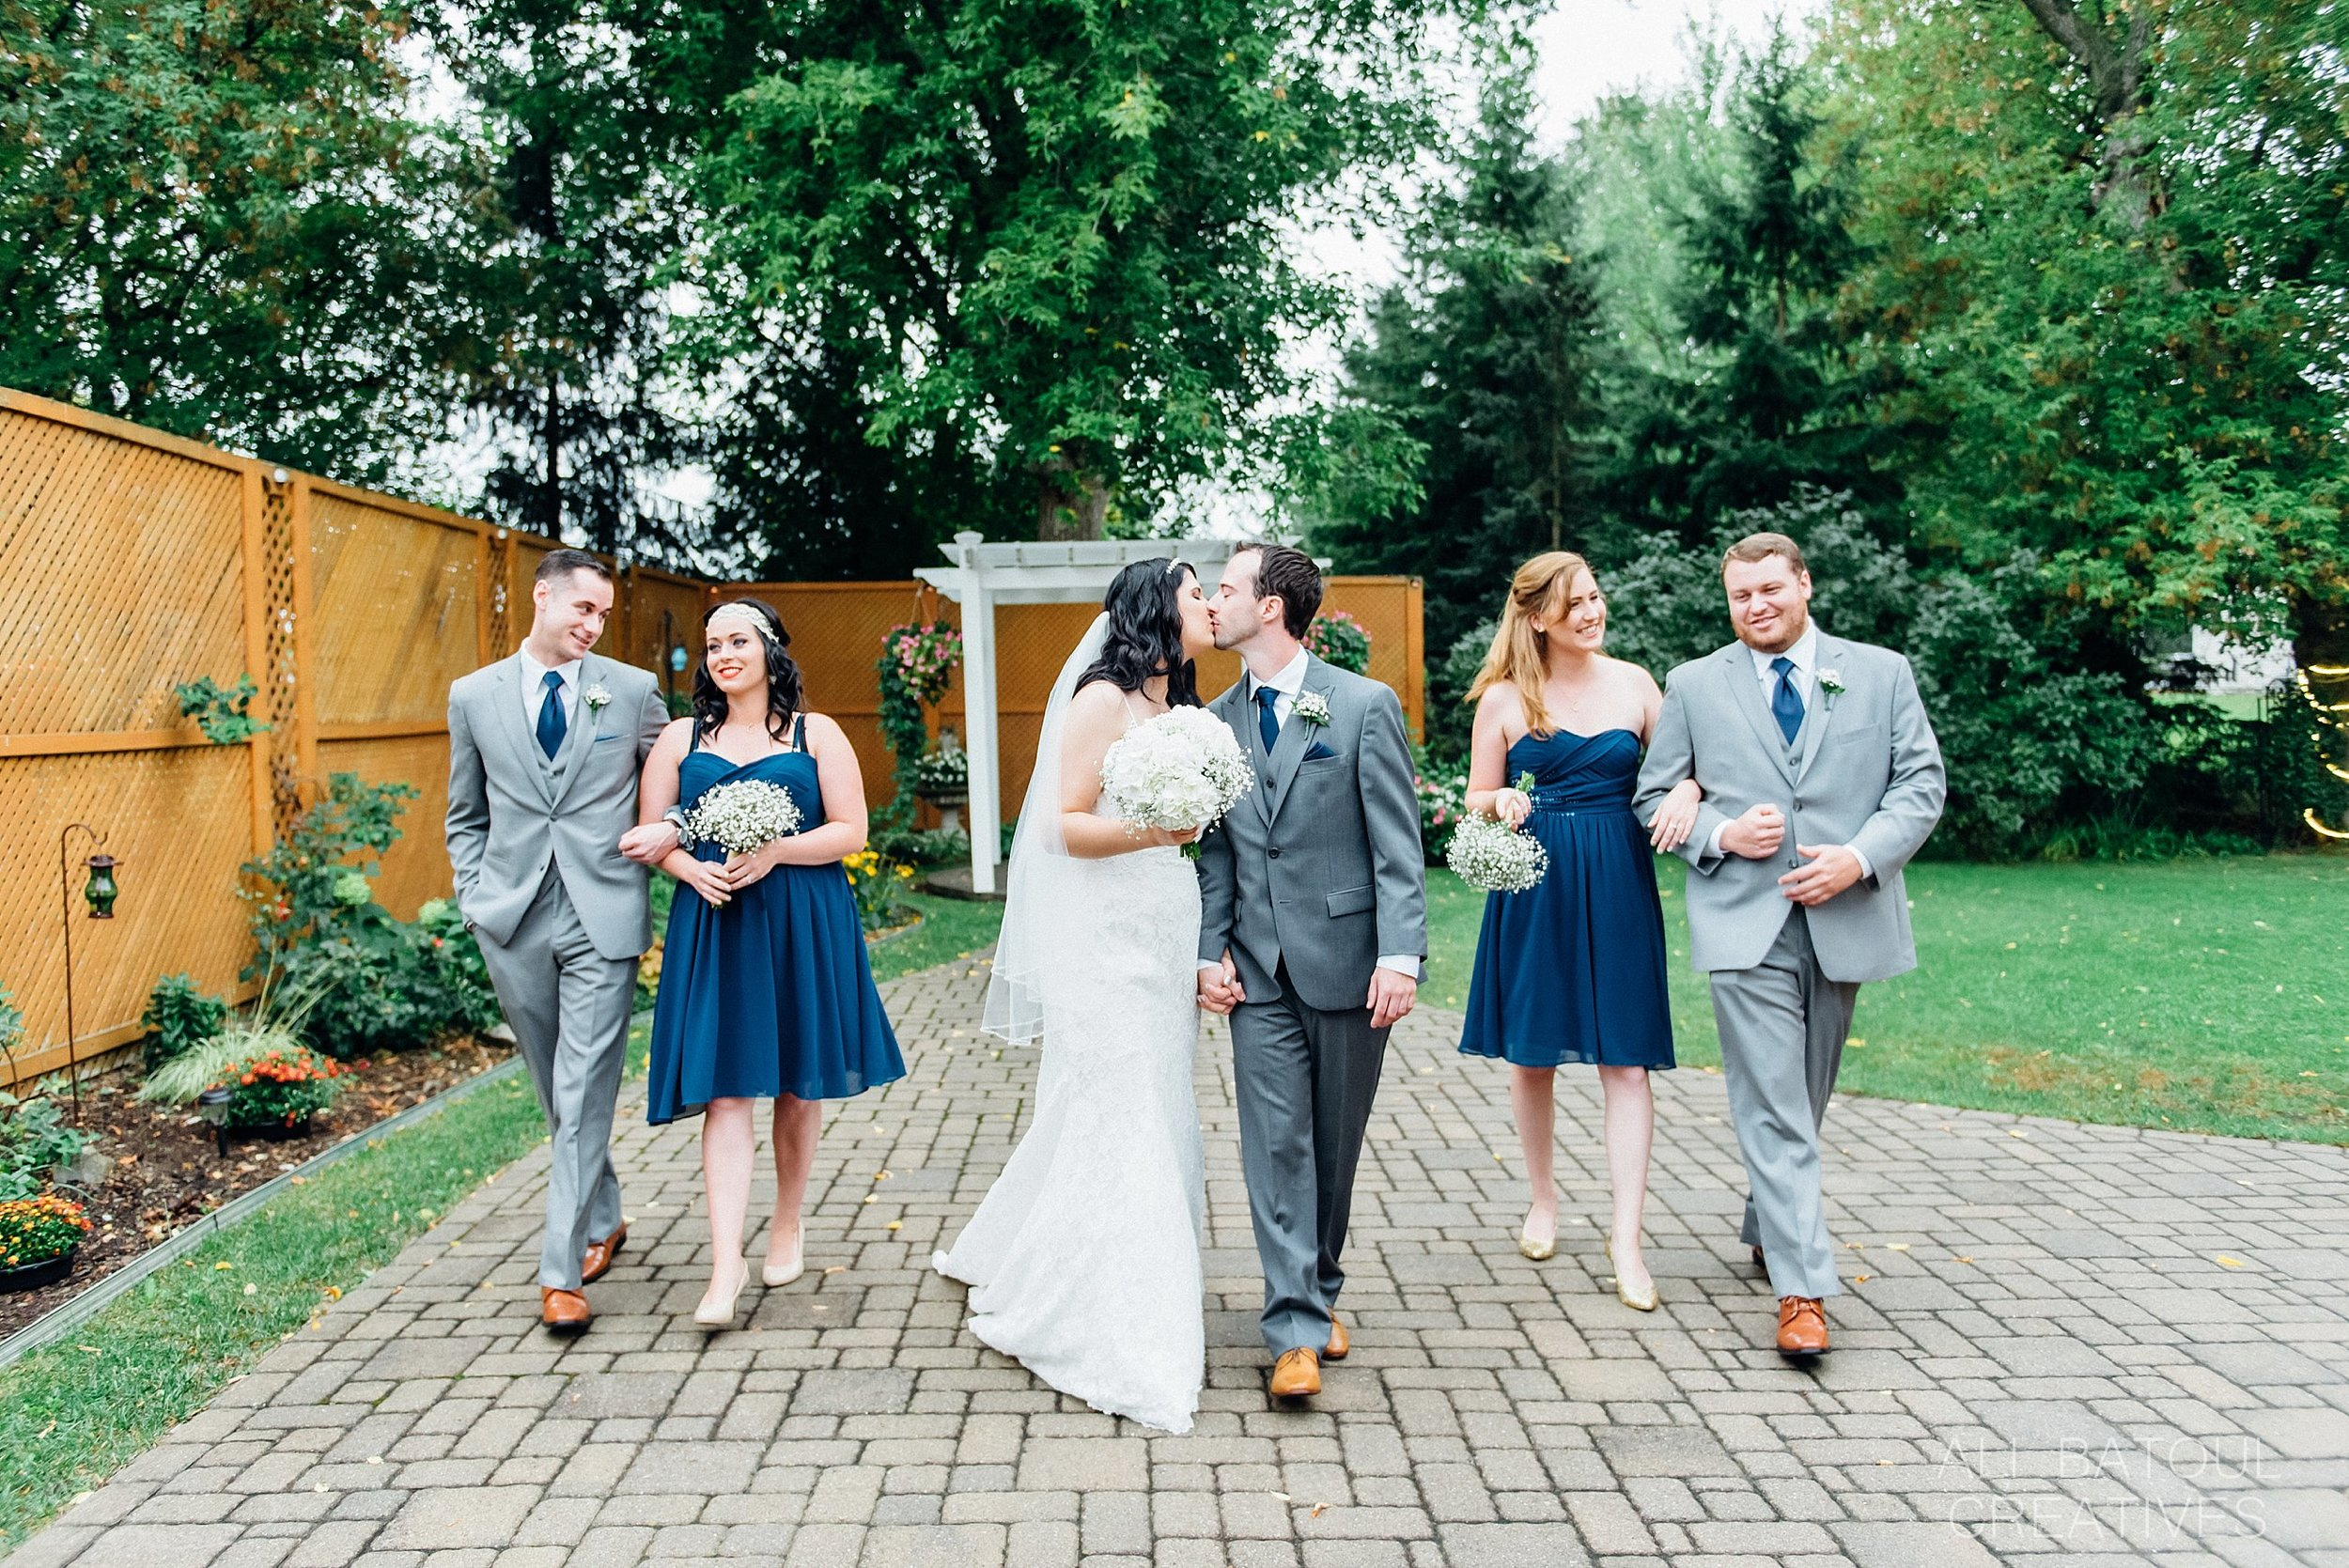 Jocelyn + Steve At The Schoolhouse Wedding - Ali and Batoul Fine Art Wedding Photography_0056.jpg